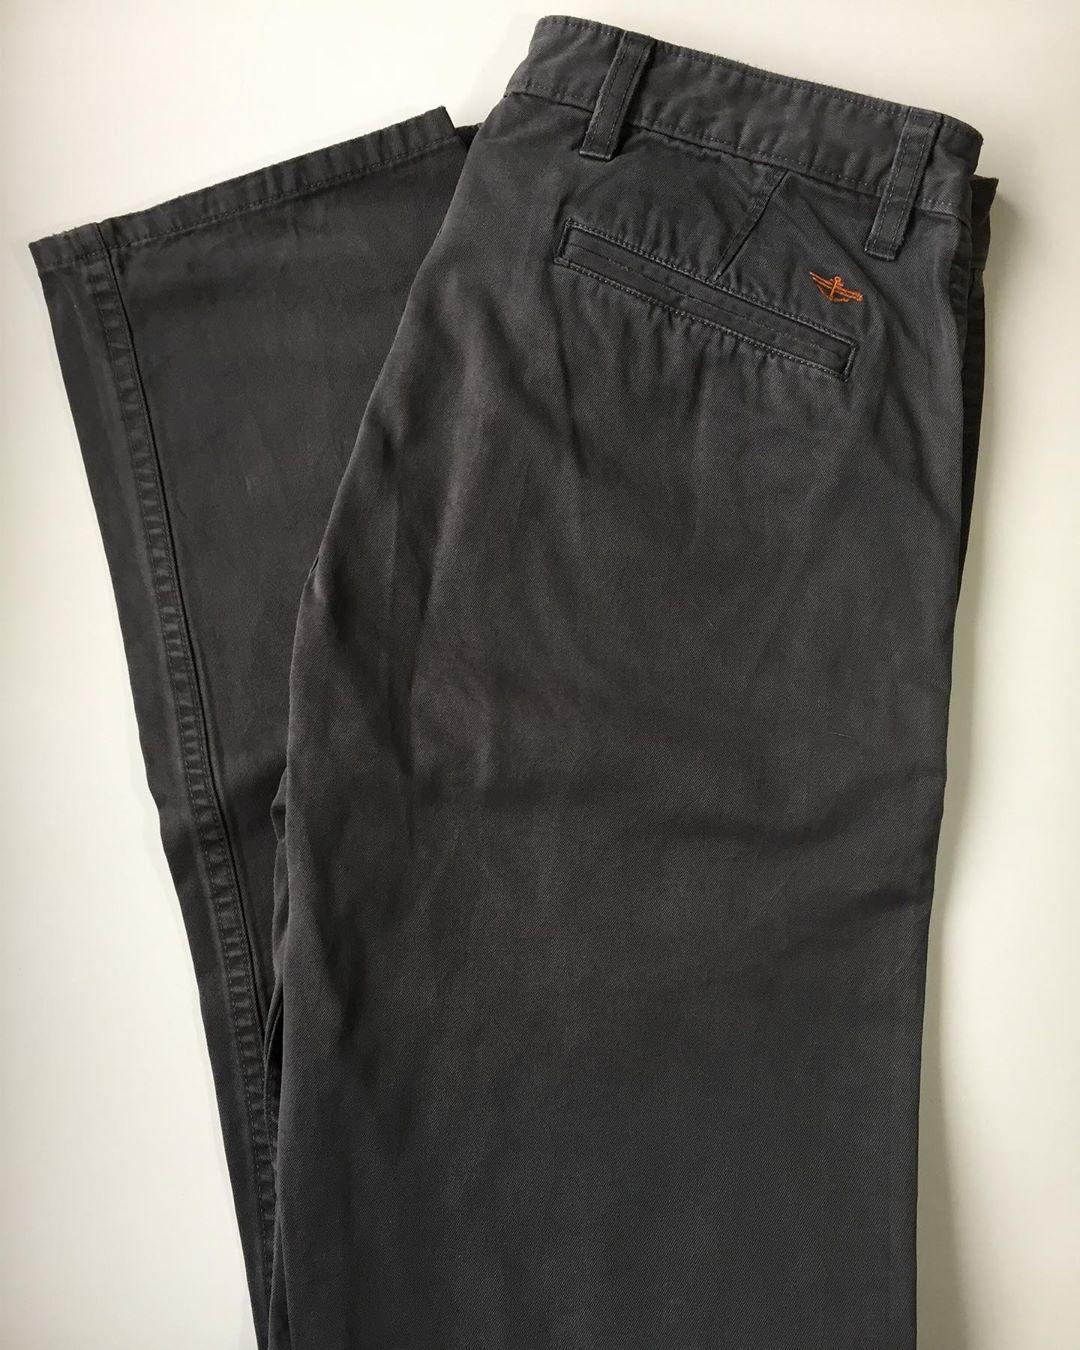 Pantalon Dockers Nuevo Color Gris Talla 44 46 Estado 10 10 Lapikastore Dockers Ccp Stgo Chile Leather Pants Fashion Natural Skin Tightening